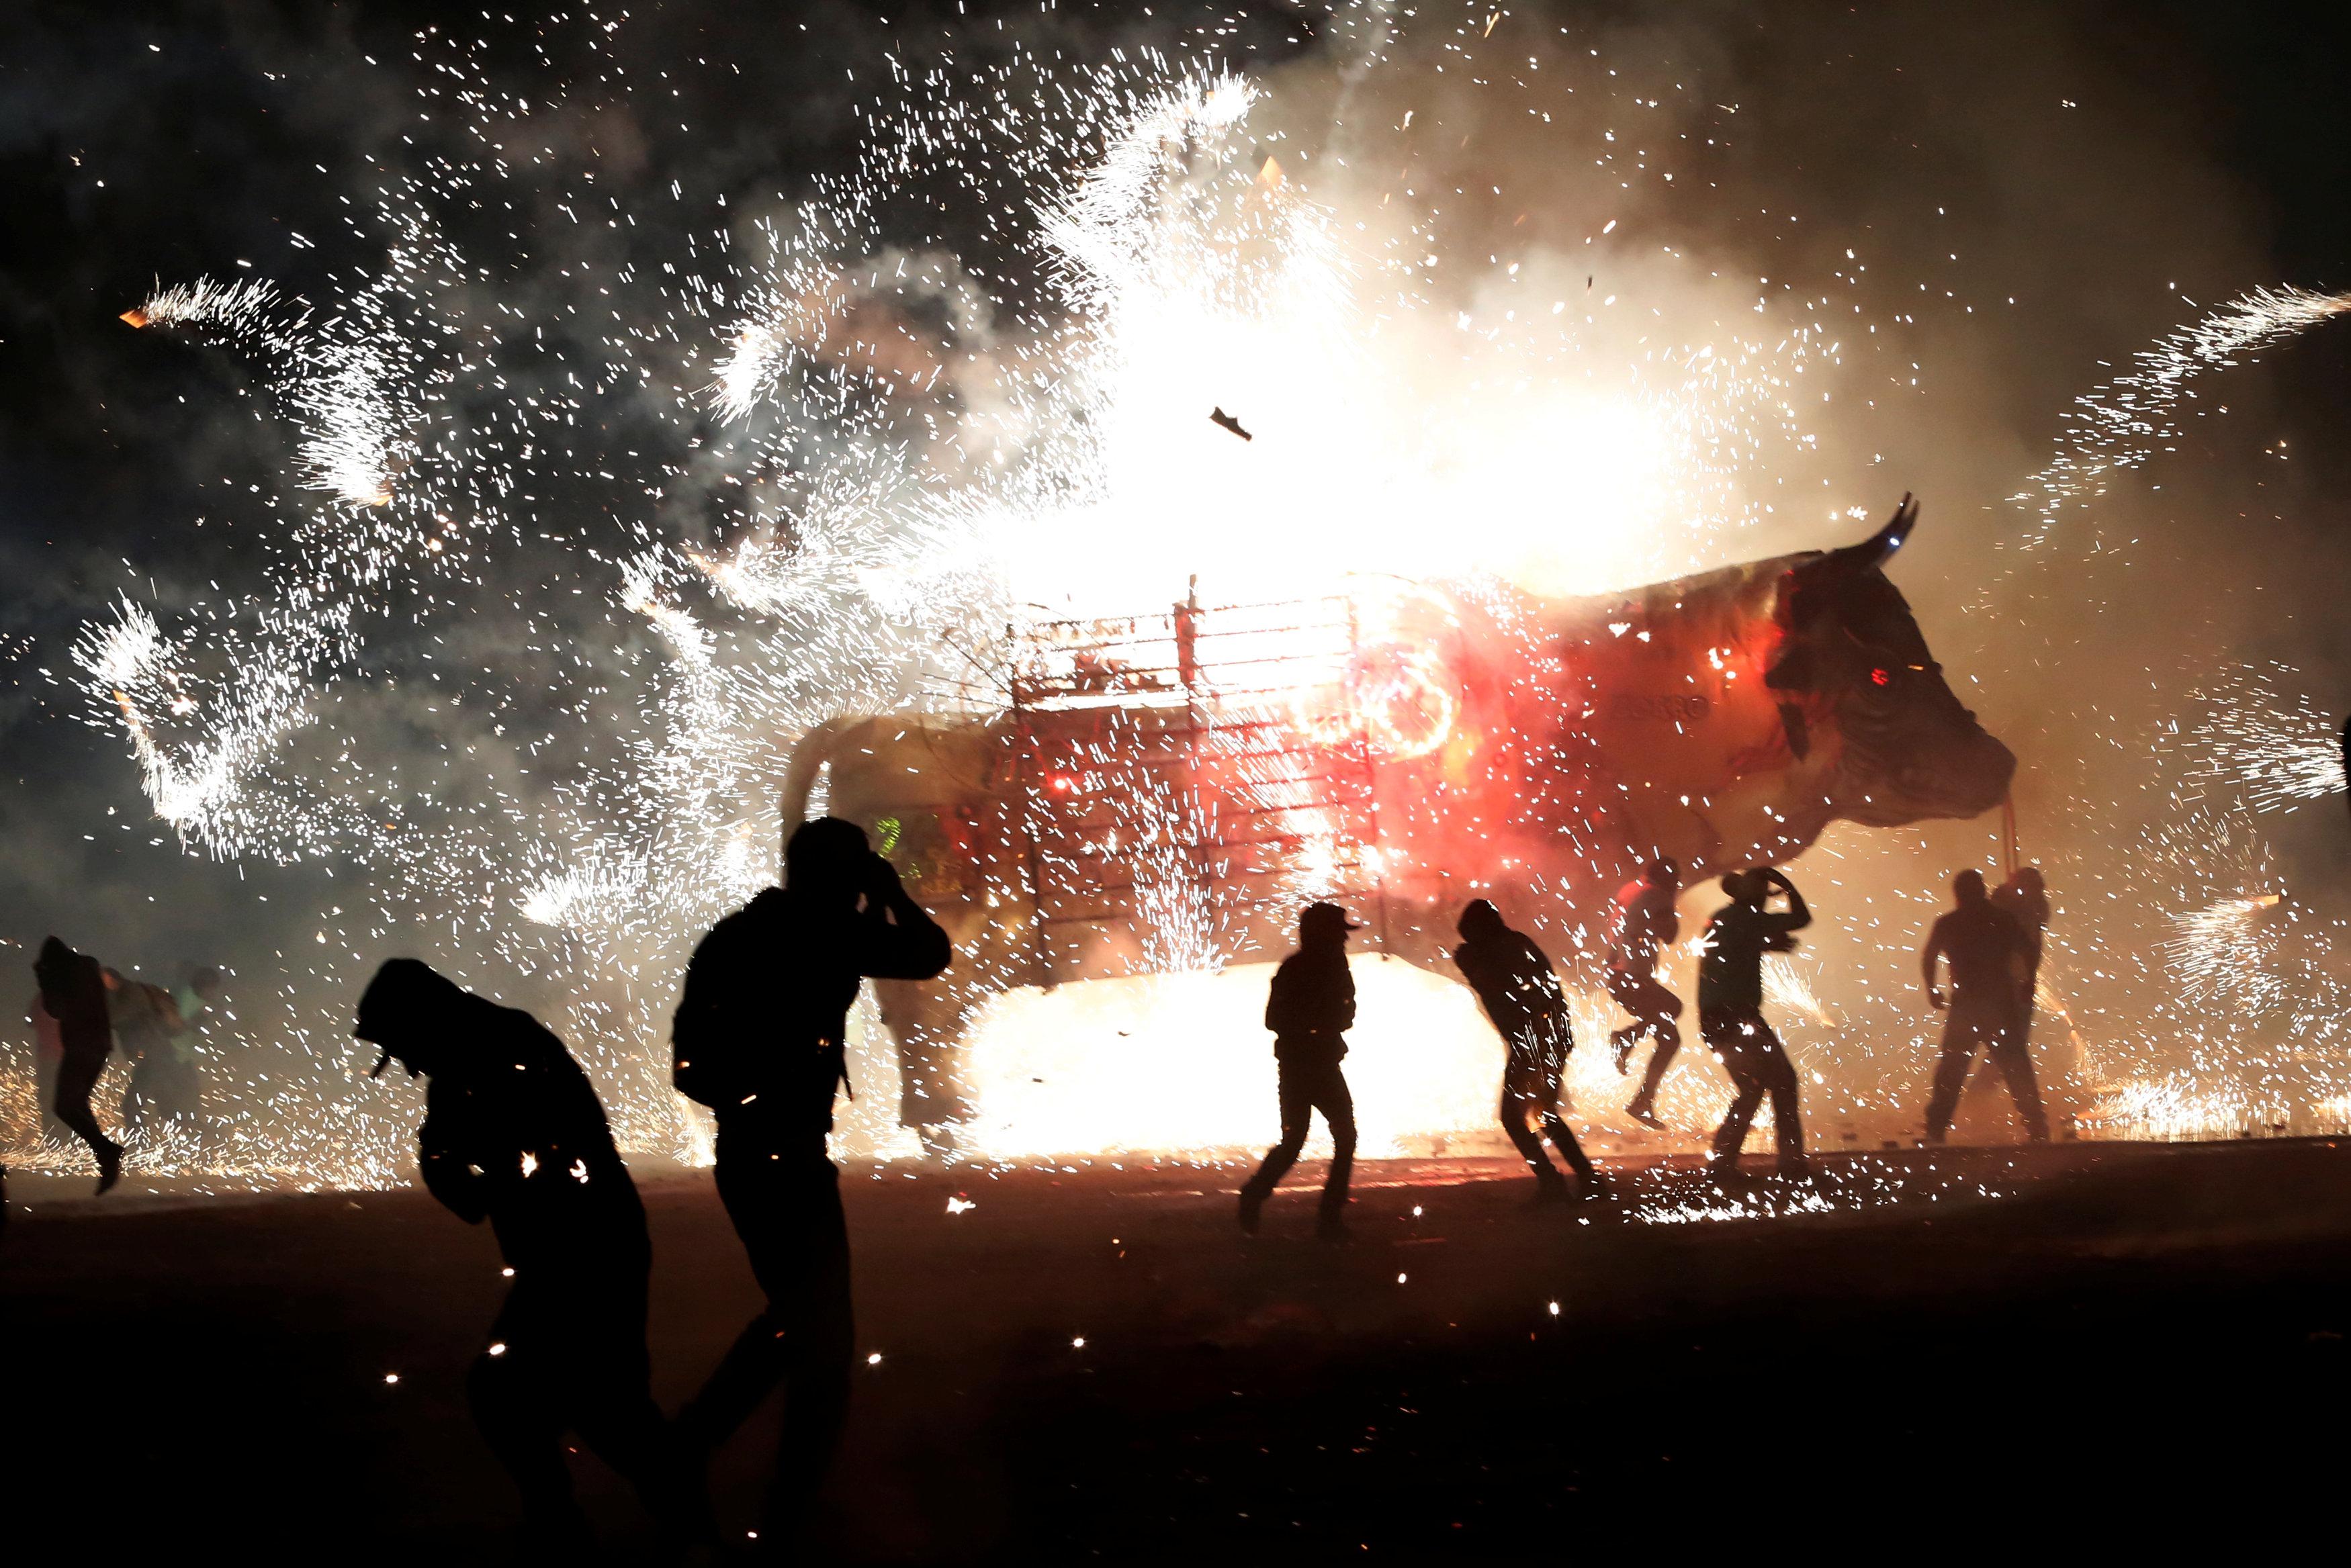 MEXICO-FIREWORKS/